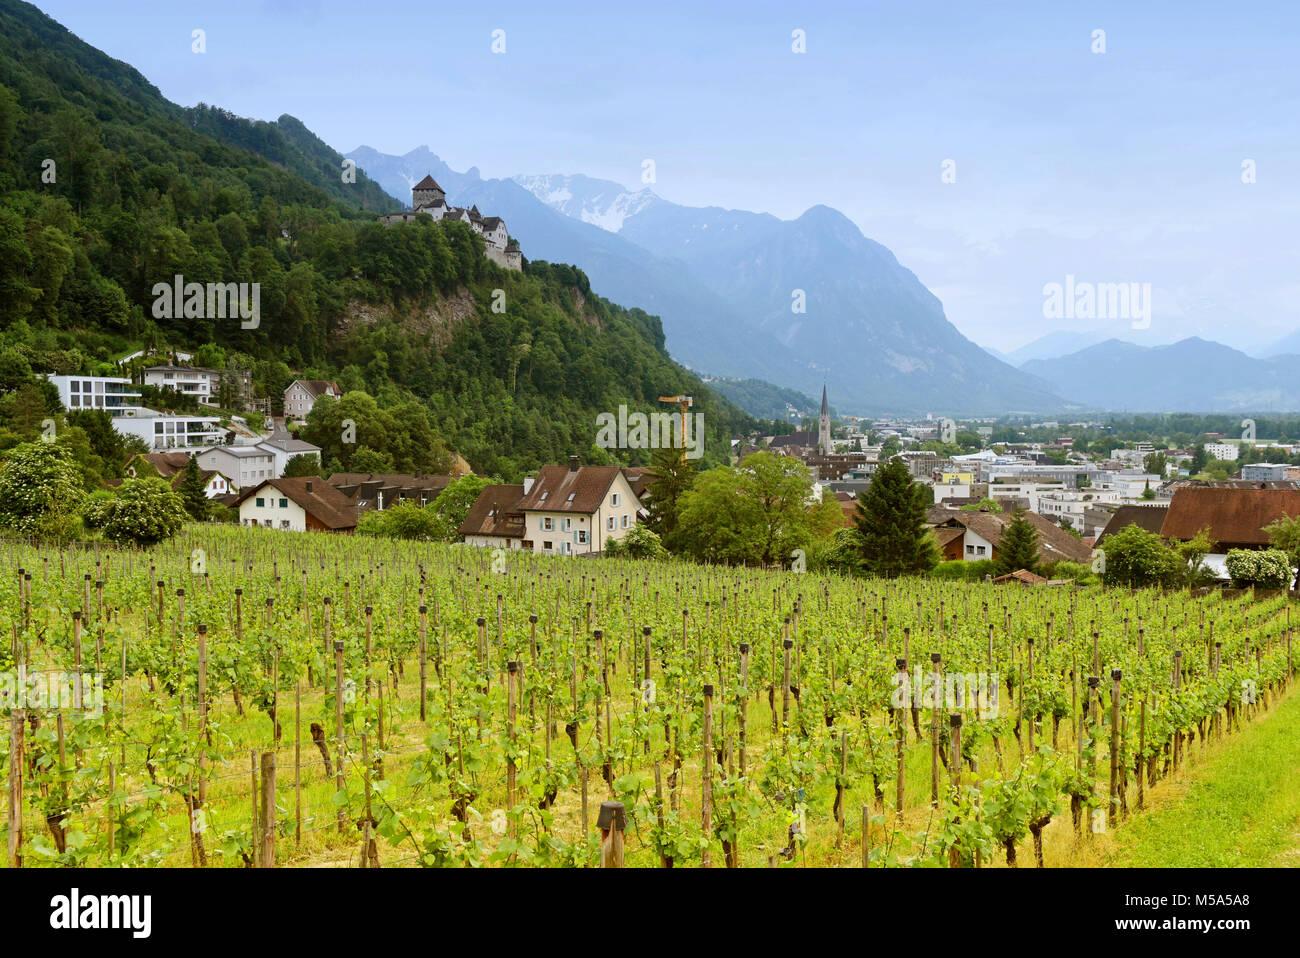 Cityscape of Vaduz, Liechtenstein - Stock Image